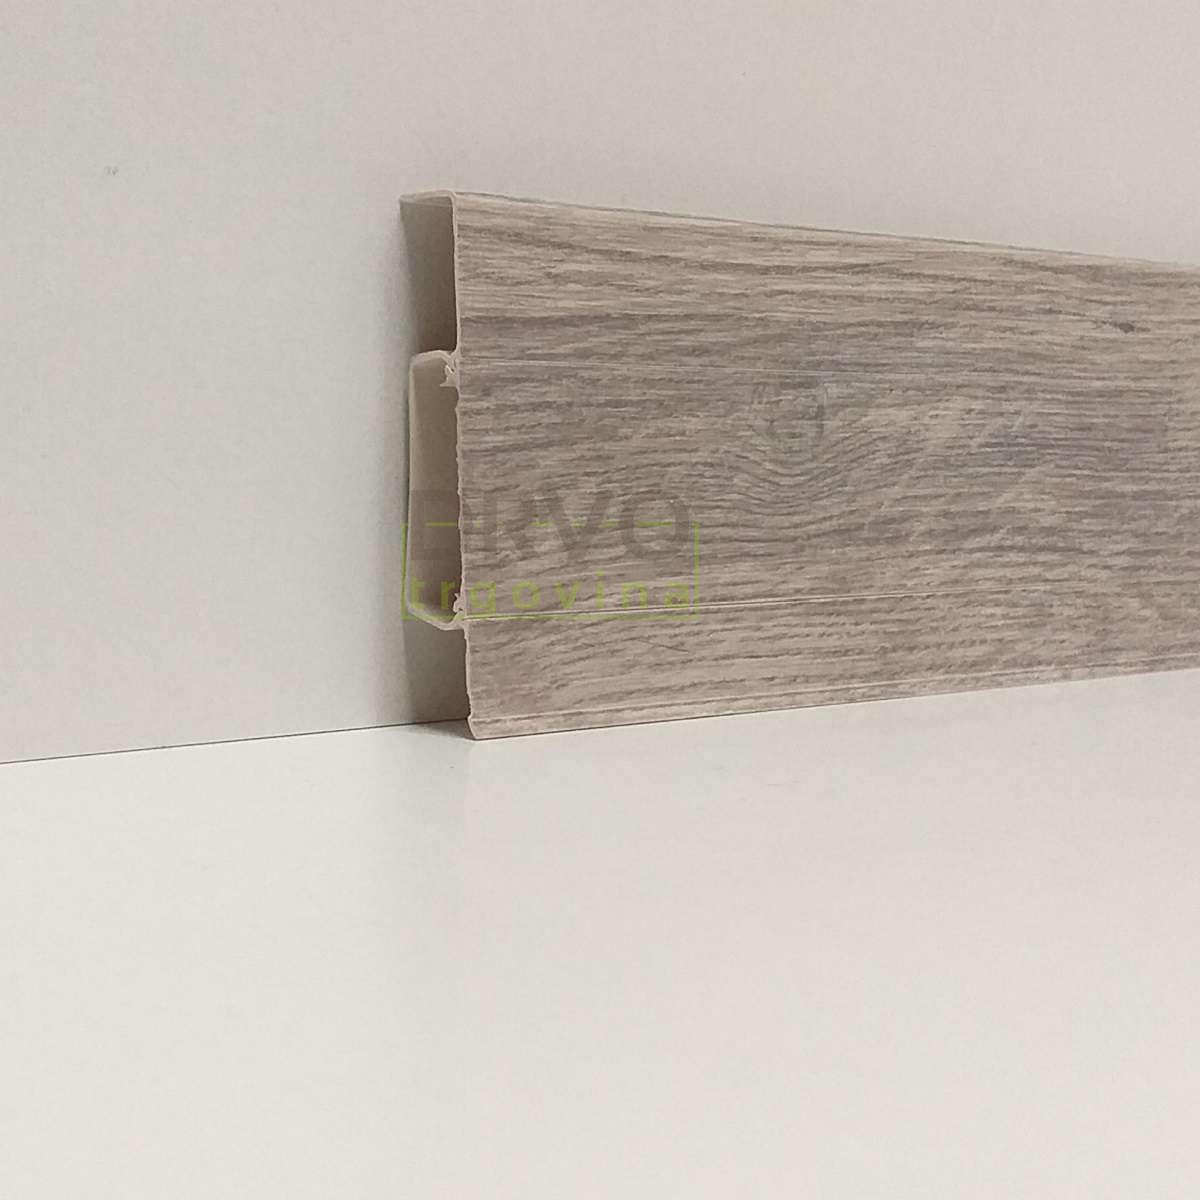 PVC LETVICA ZA LAMINAT HI LINE M278 /40037/40030/2032  LUCKNOR 2,5m